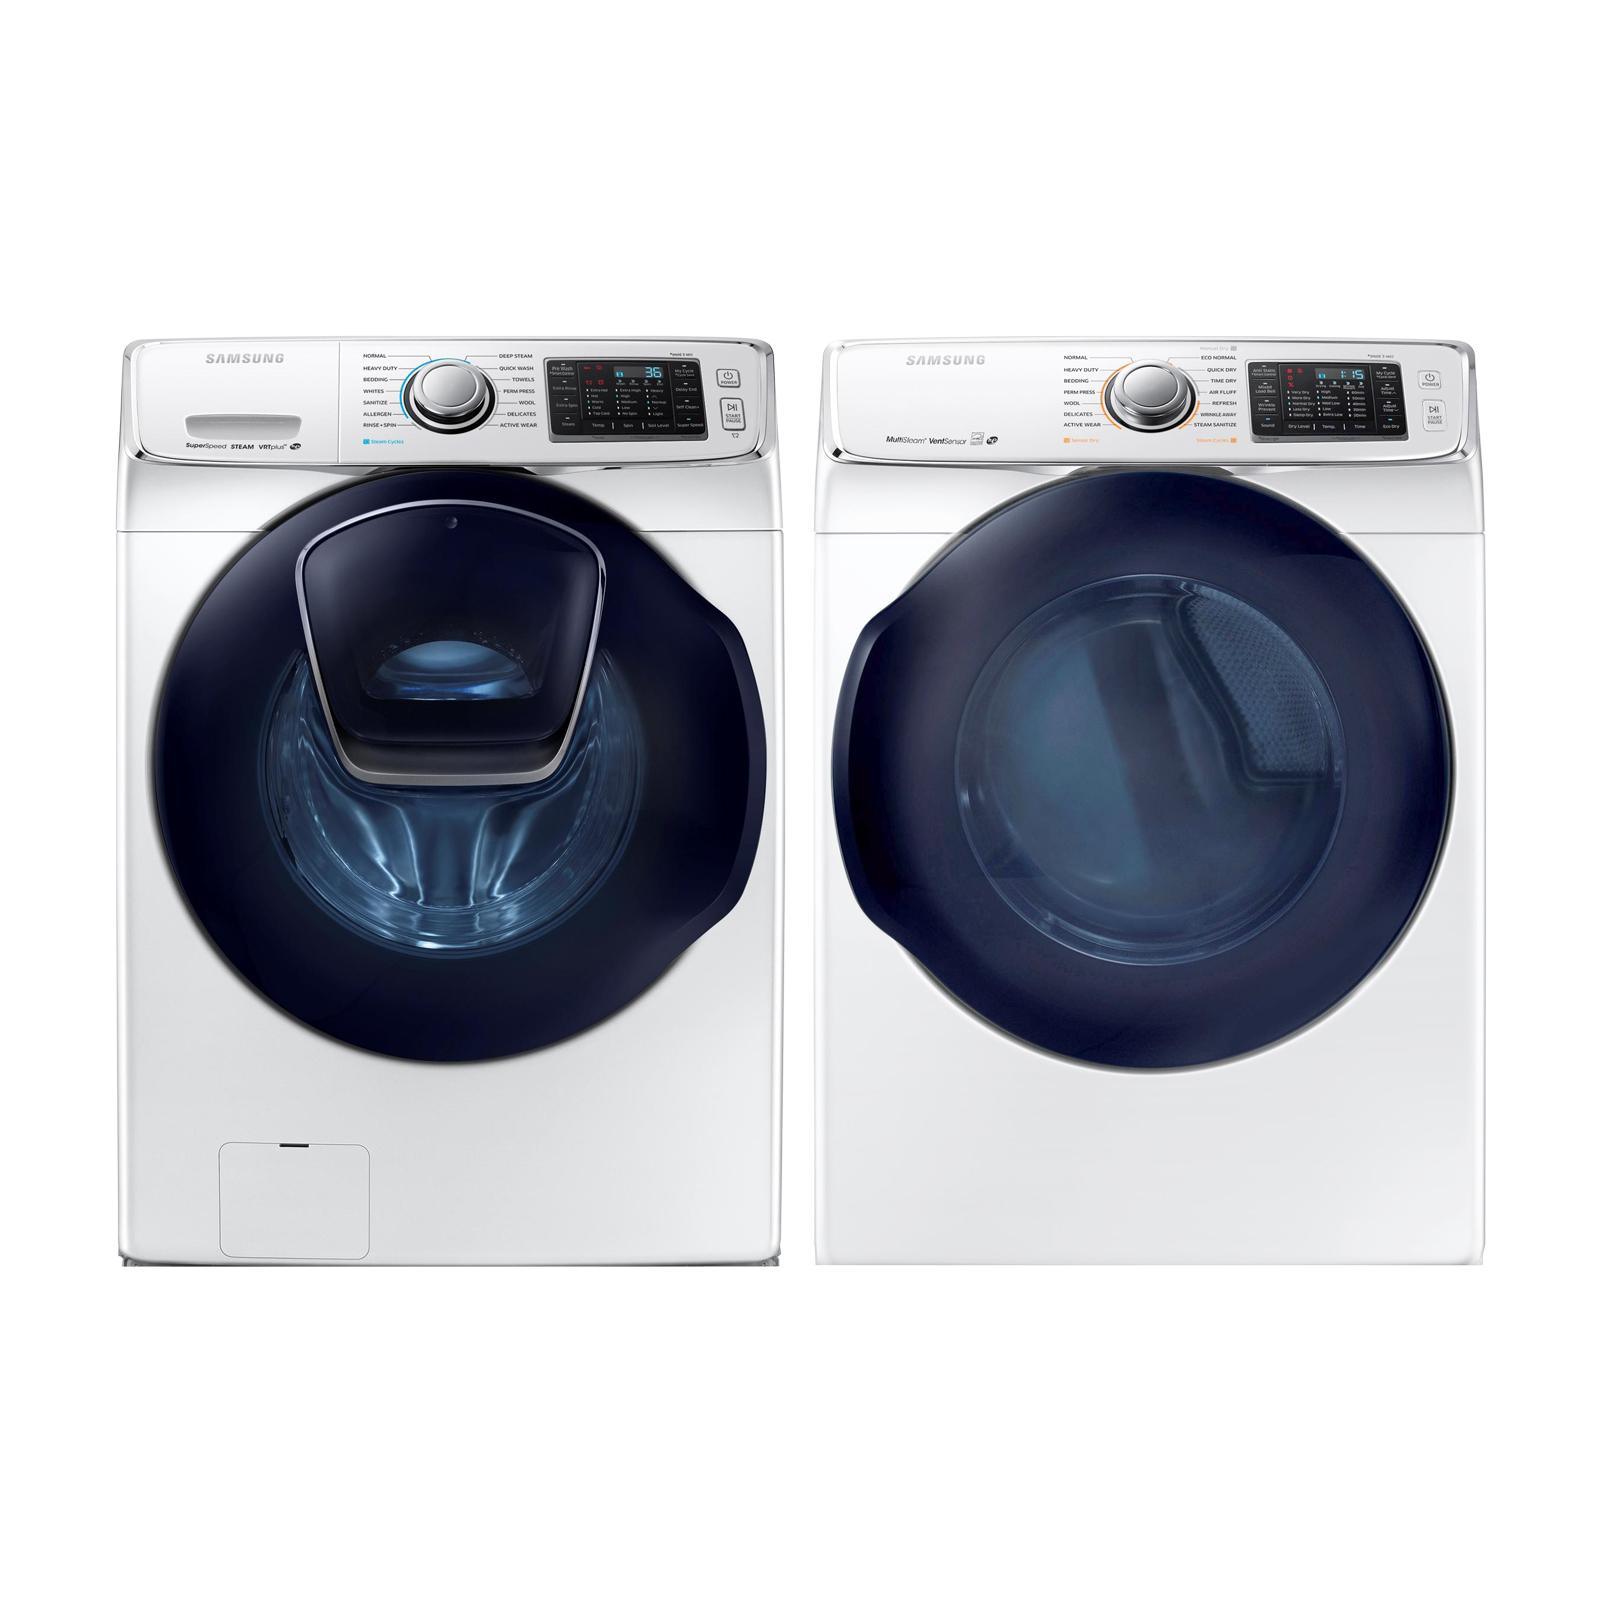 4.5 cu. ft. AddWash Front Load Washer and 7.5 cu. Ft Dryer Bundle - White